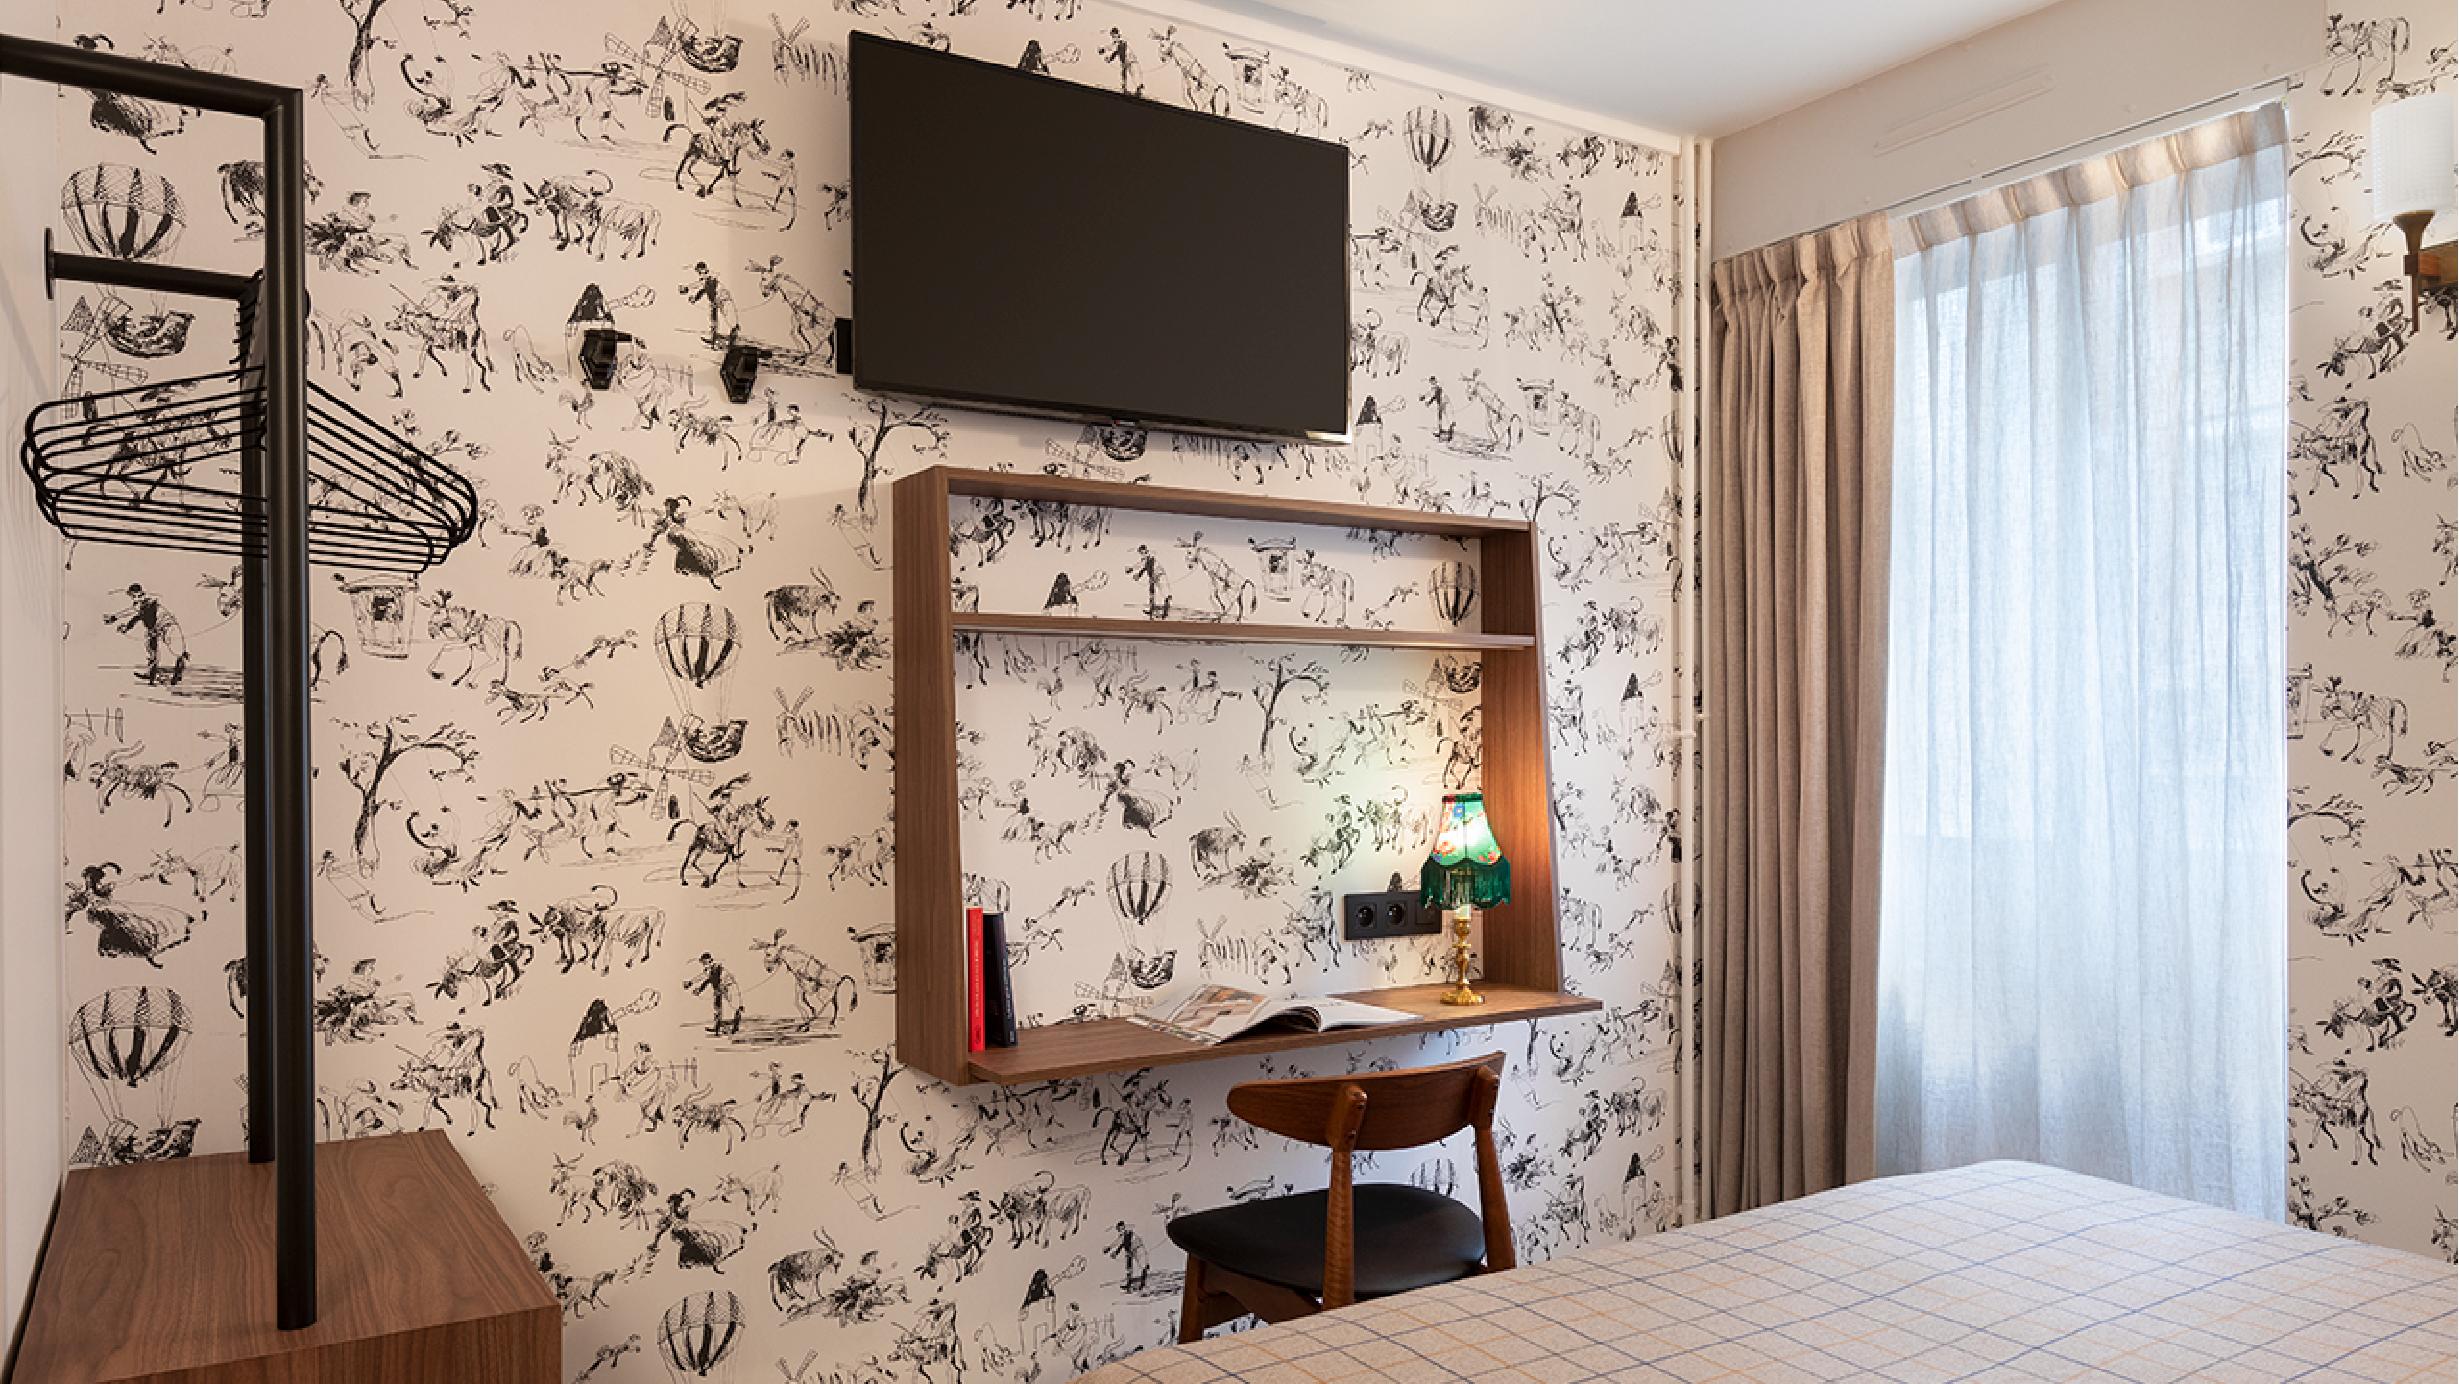 maison-barbillon-grenoble-detail-chambre